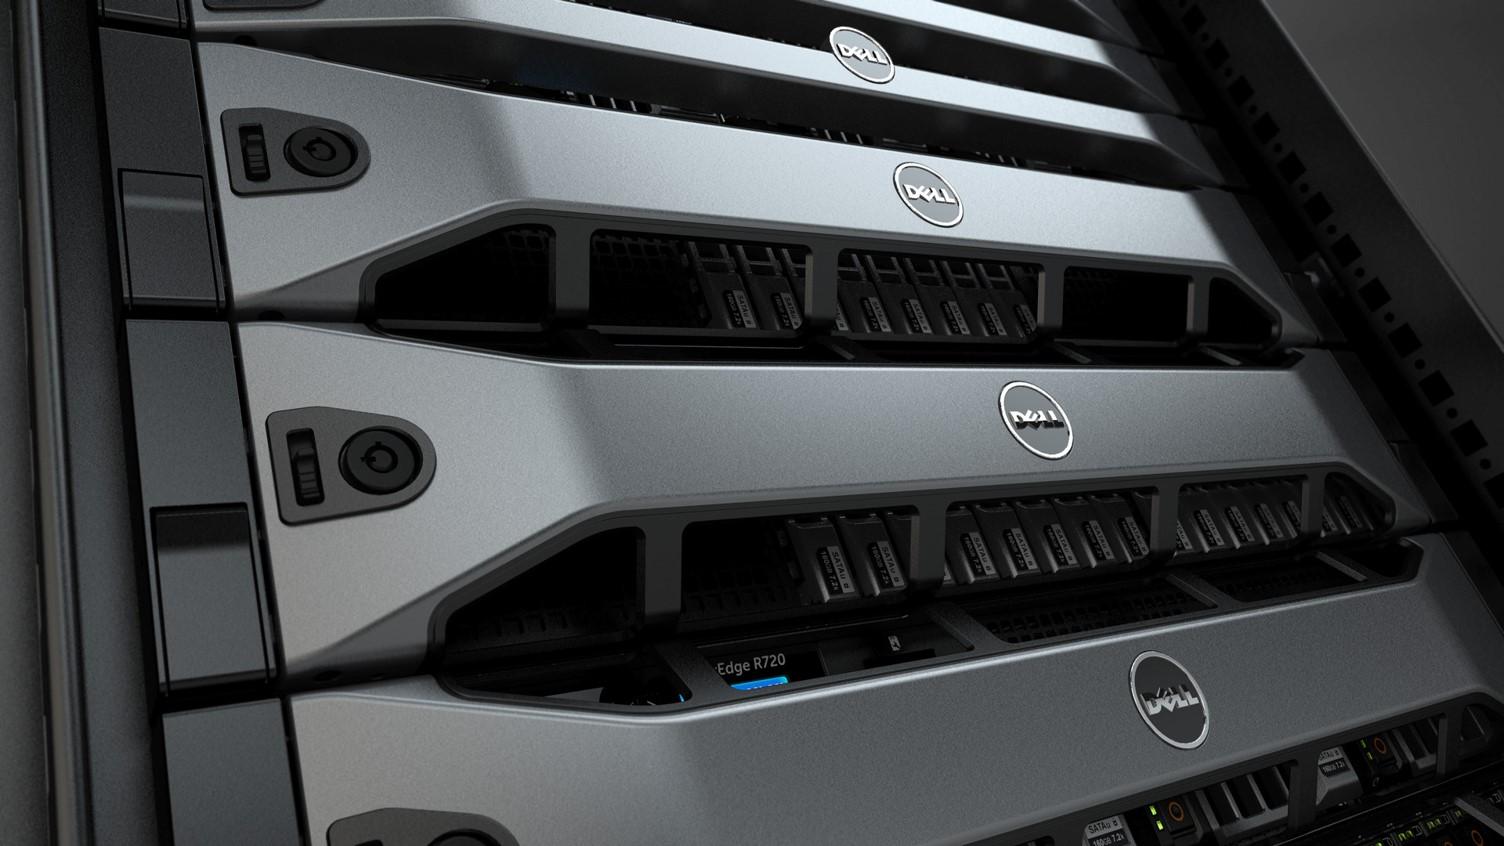 poweredge 11g - Rack Server Visual Brand Language